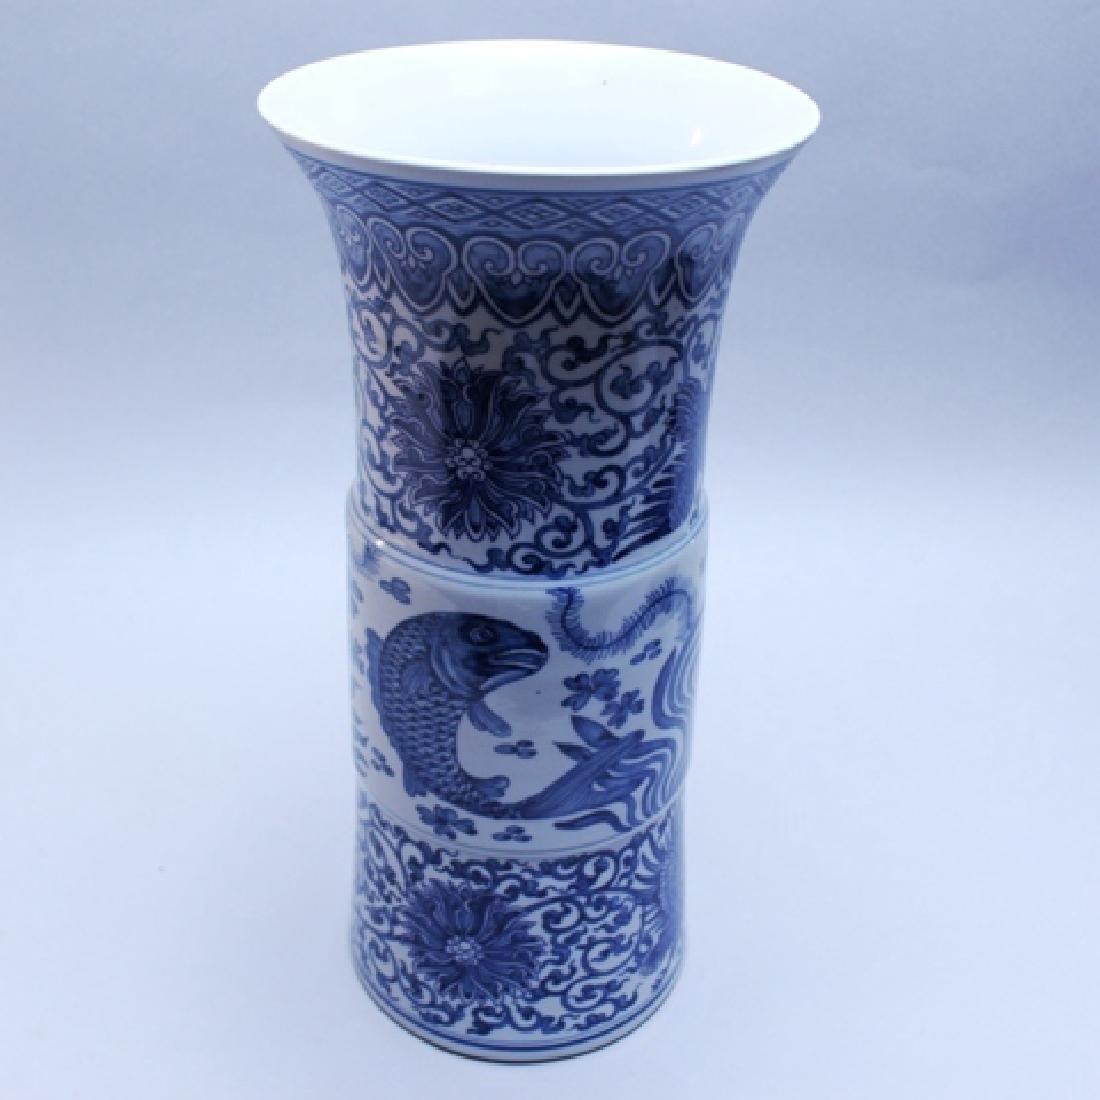 Decorative Blue and White Porcelain Gu Vase - 4